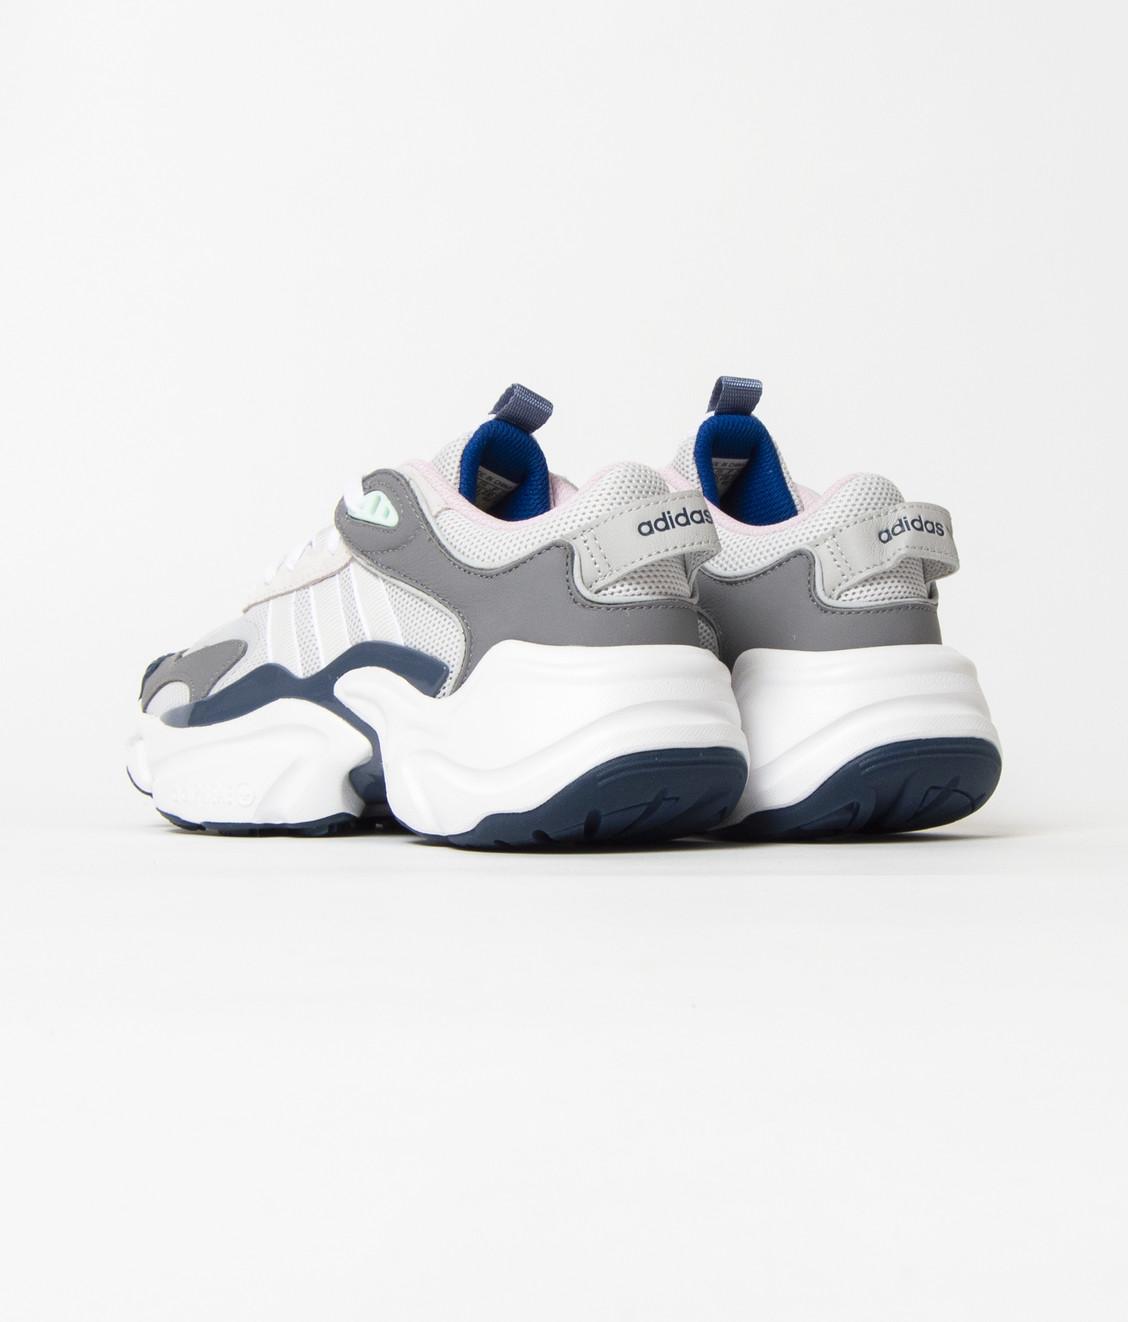 Adidas Adidas Magmur Runner Grey One